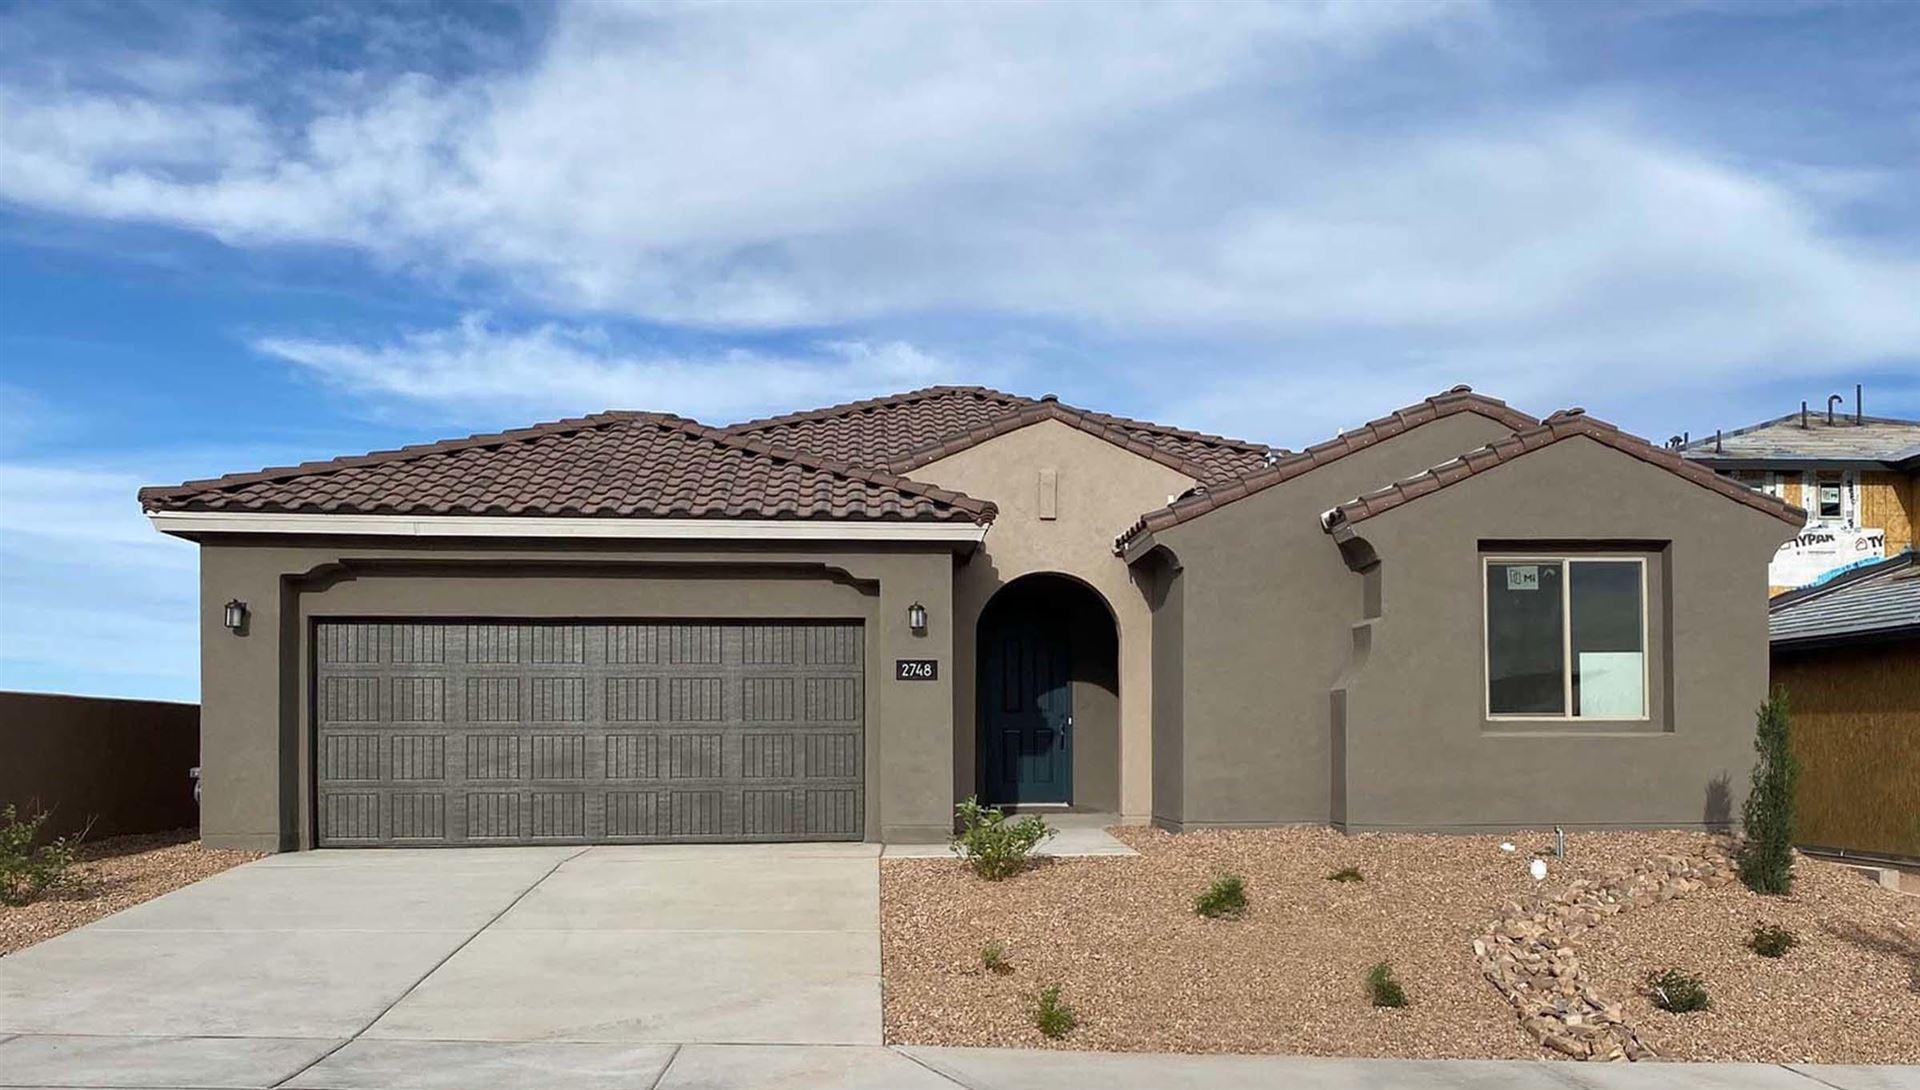 Photo of 2748 Kings Canyon Loop NE, Rio Rancho, NM 87144 (MLS # 971717)